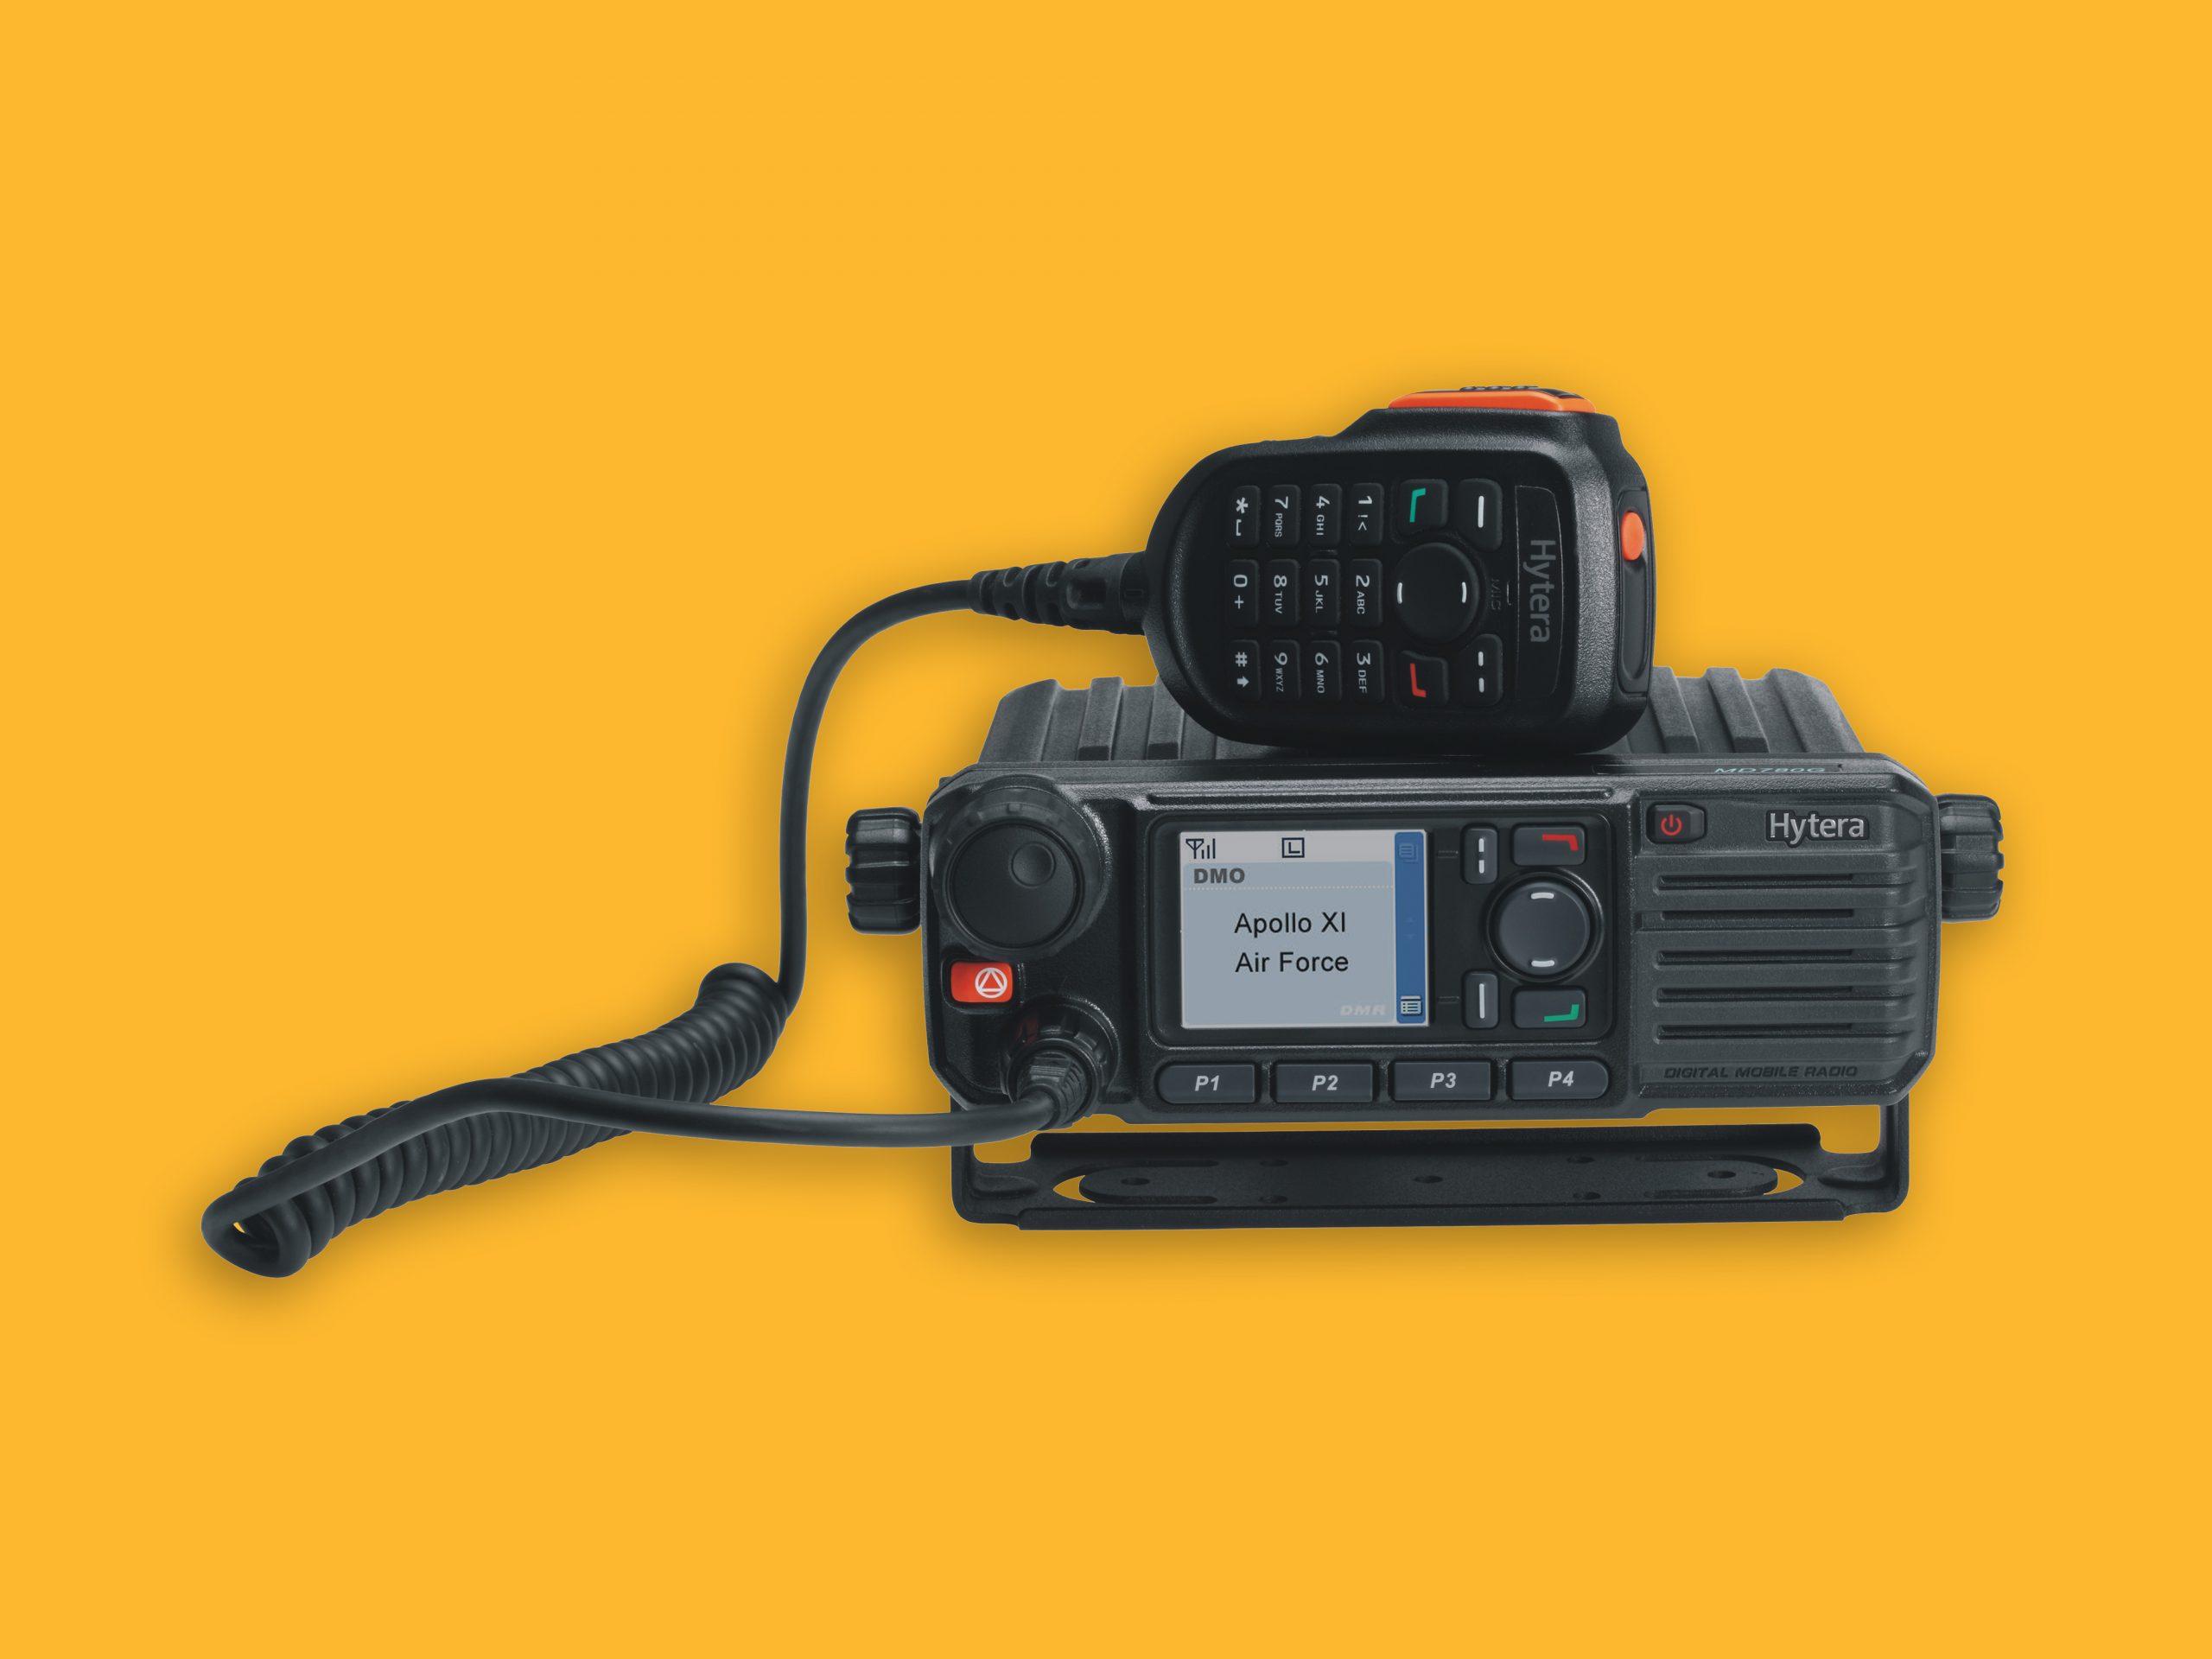 Hytera Mobile Radio